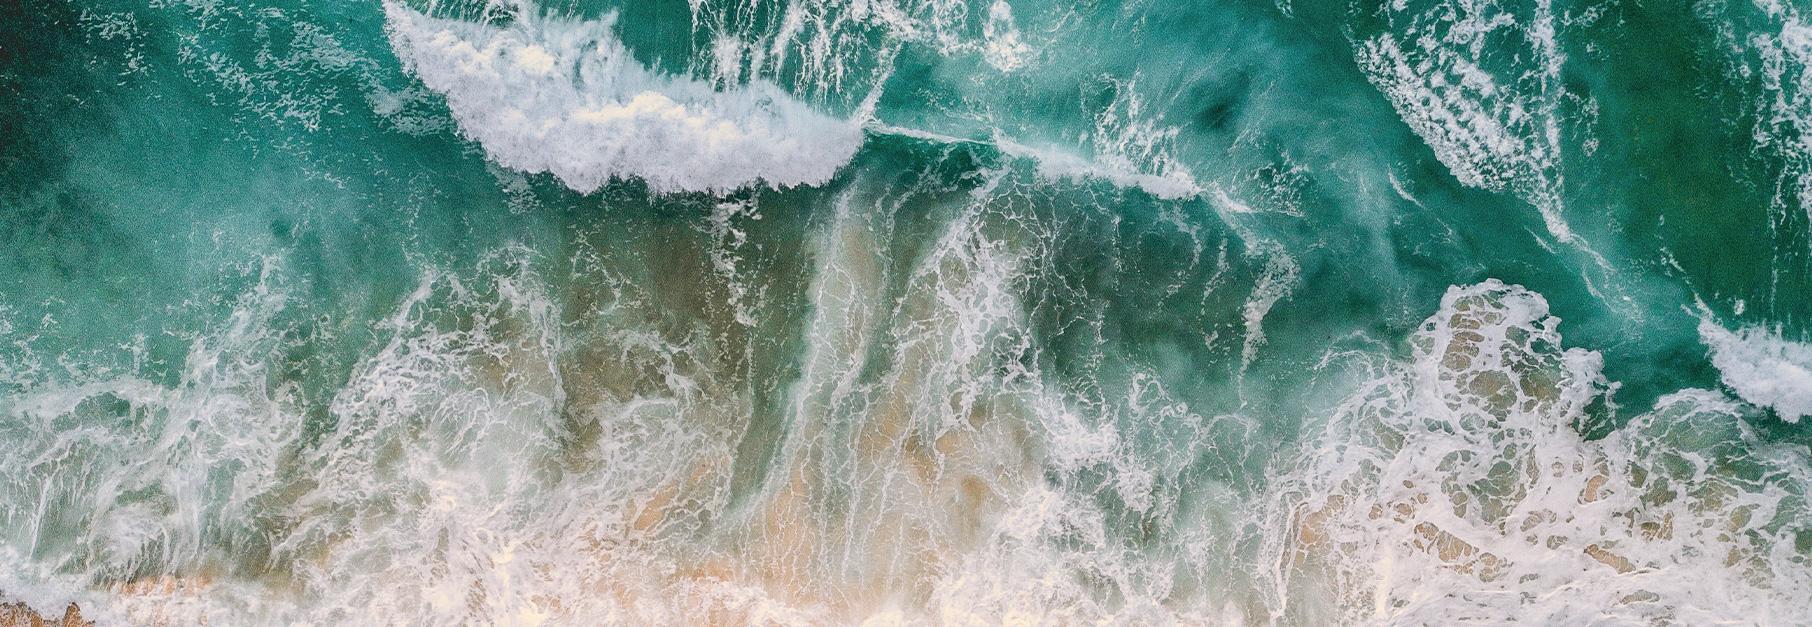 Newsletter Medio Ambiente Septiembre 2019